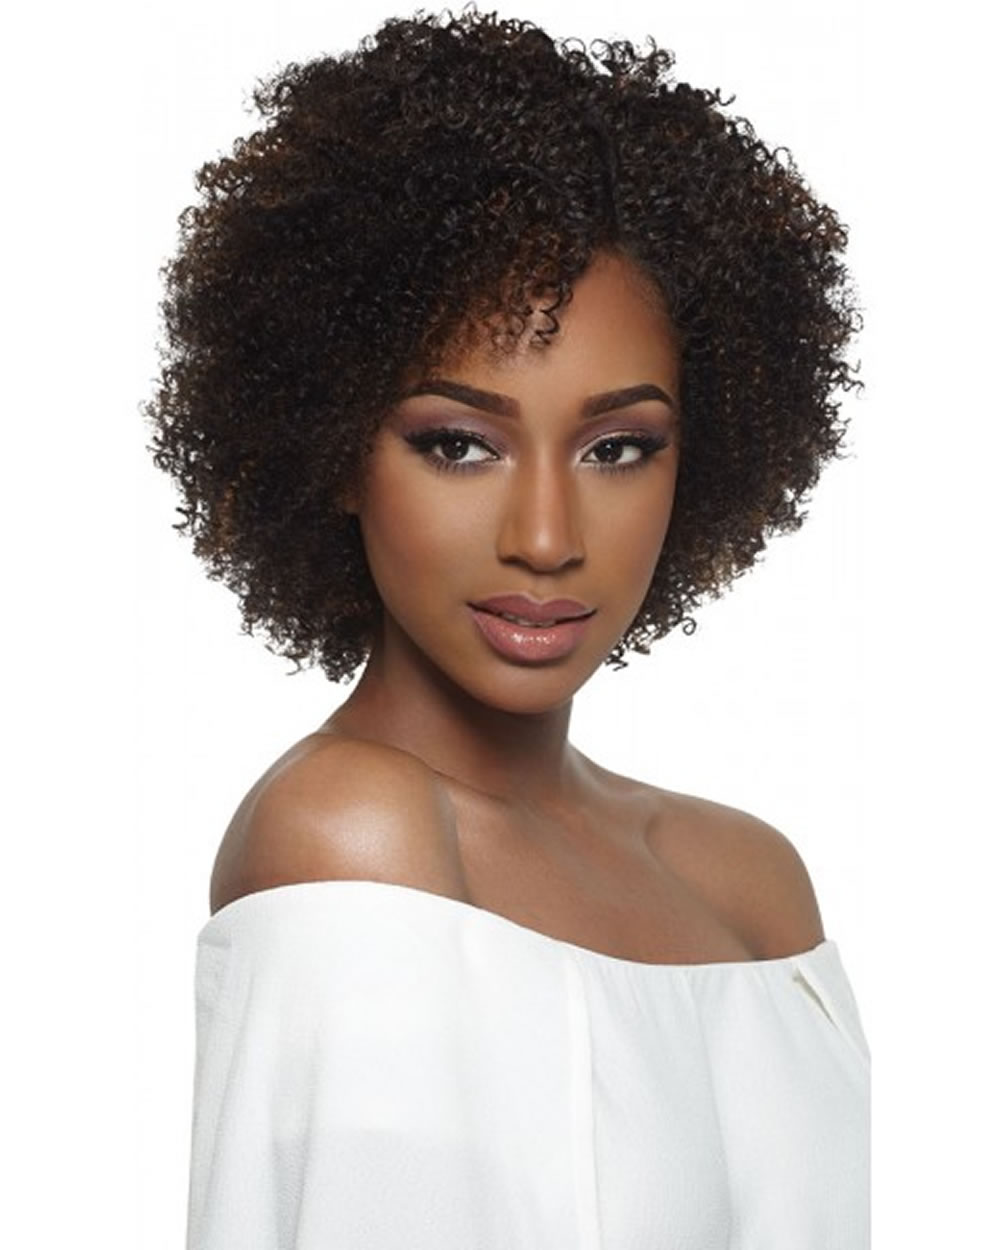 ShortNatural Hairstyles 2019 -African American Girl 3